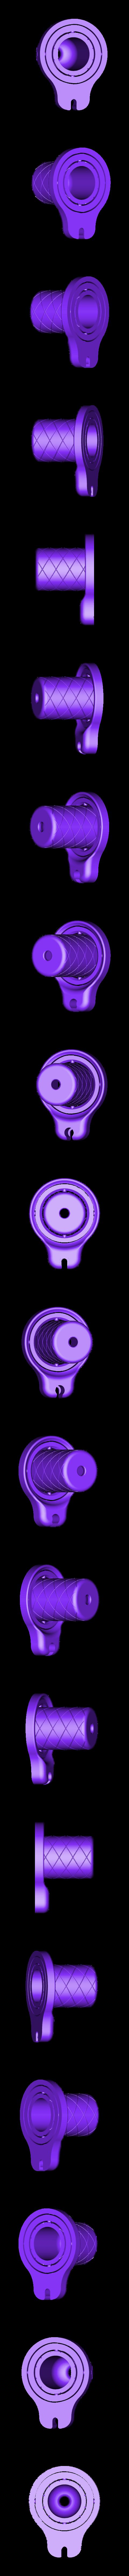 Grouped_Model.stl Download free STL file Self-righting Gimballed drinks holder • 3D printer model, 3D-Designs